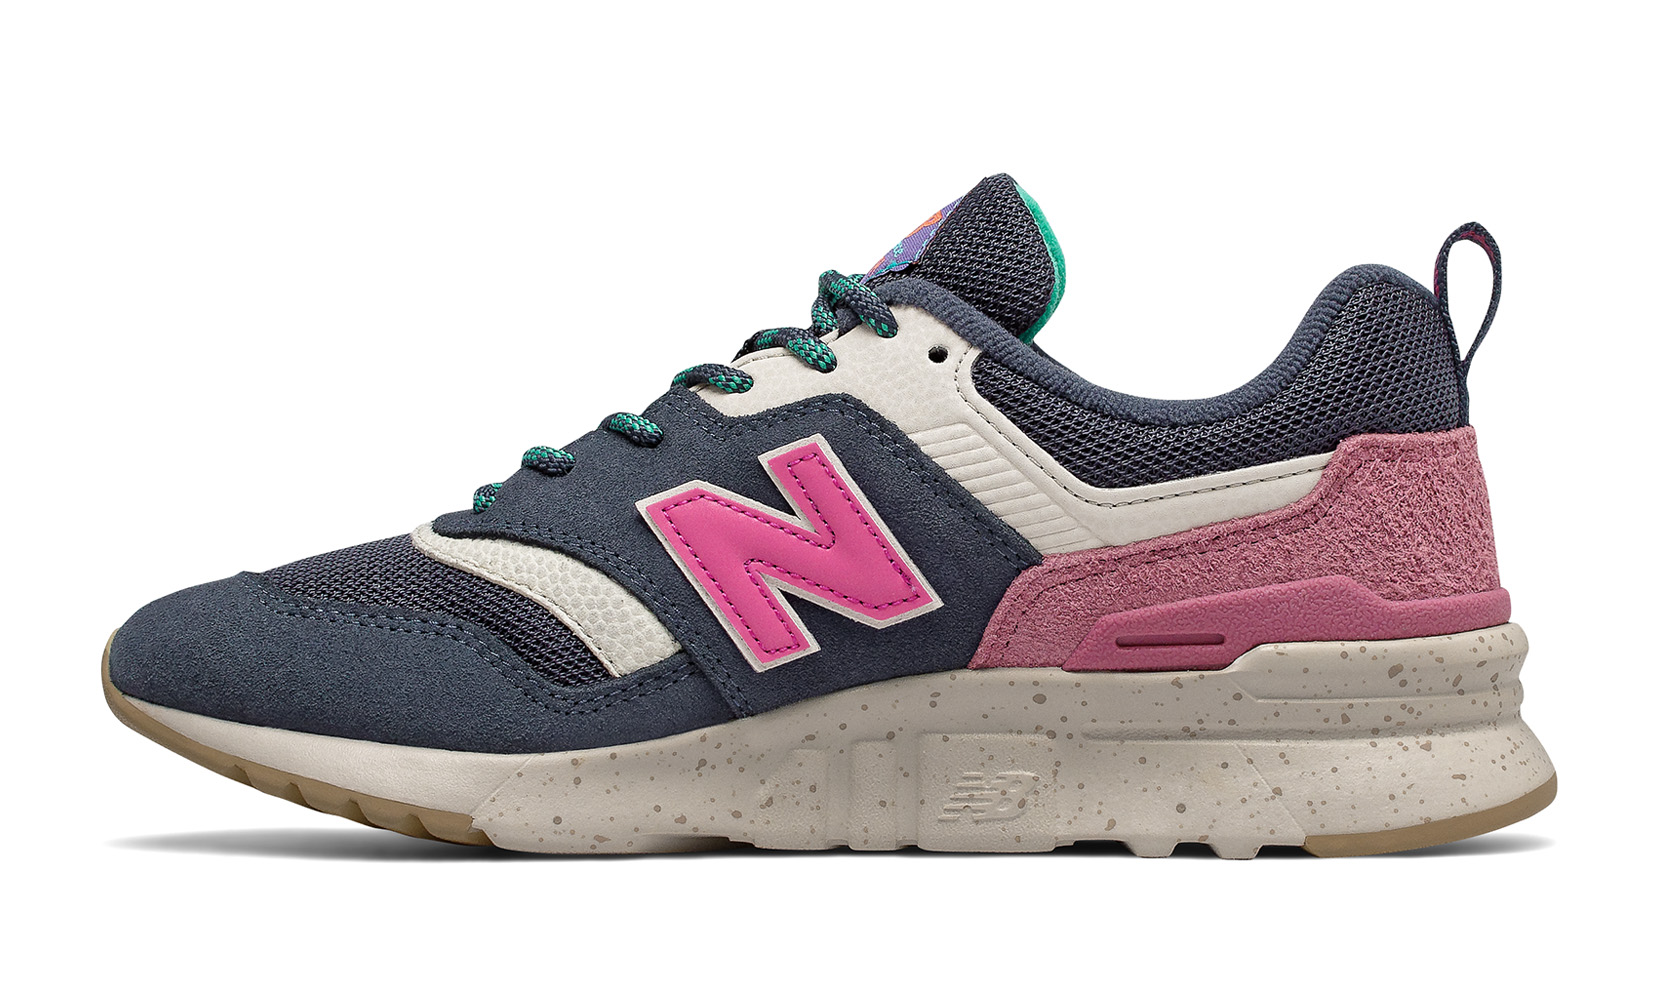 Жіноче взуття повсякденне New Balance 997H CW997HOC | New Balance